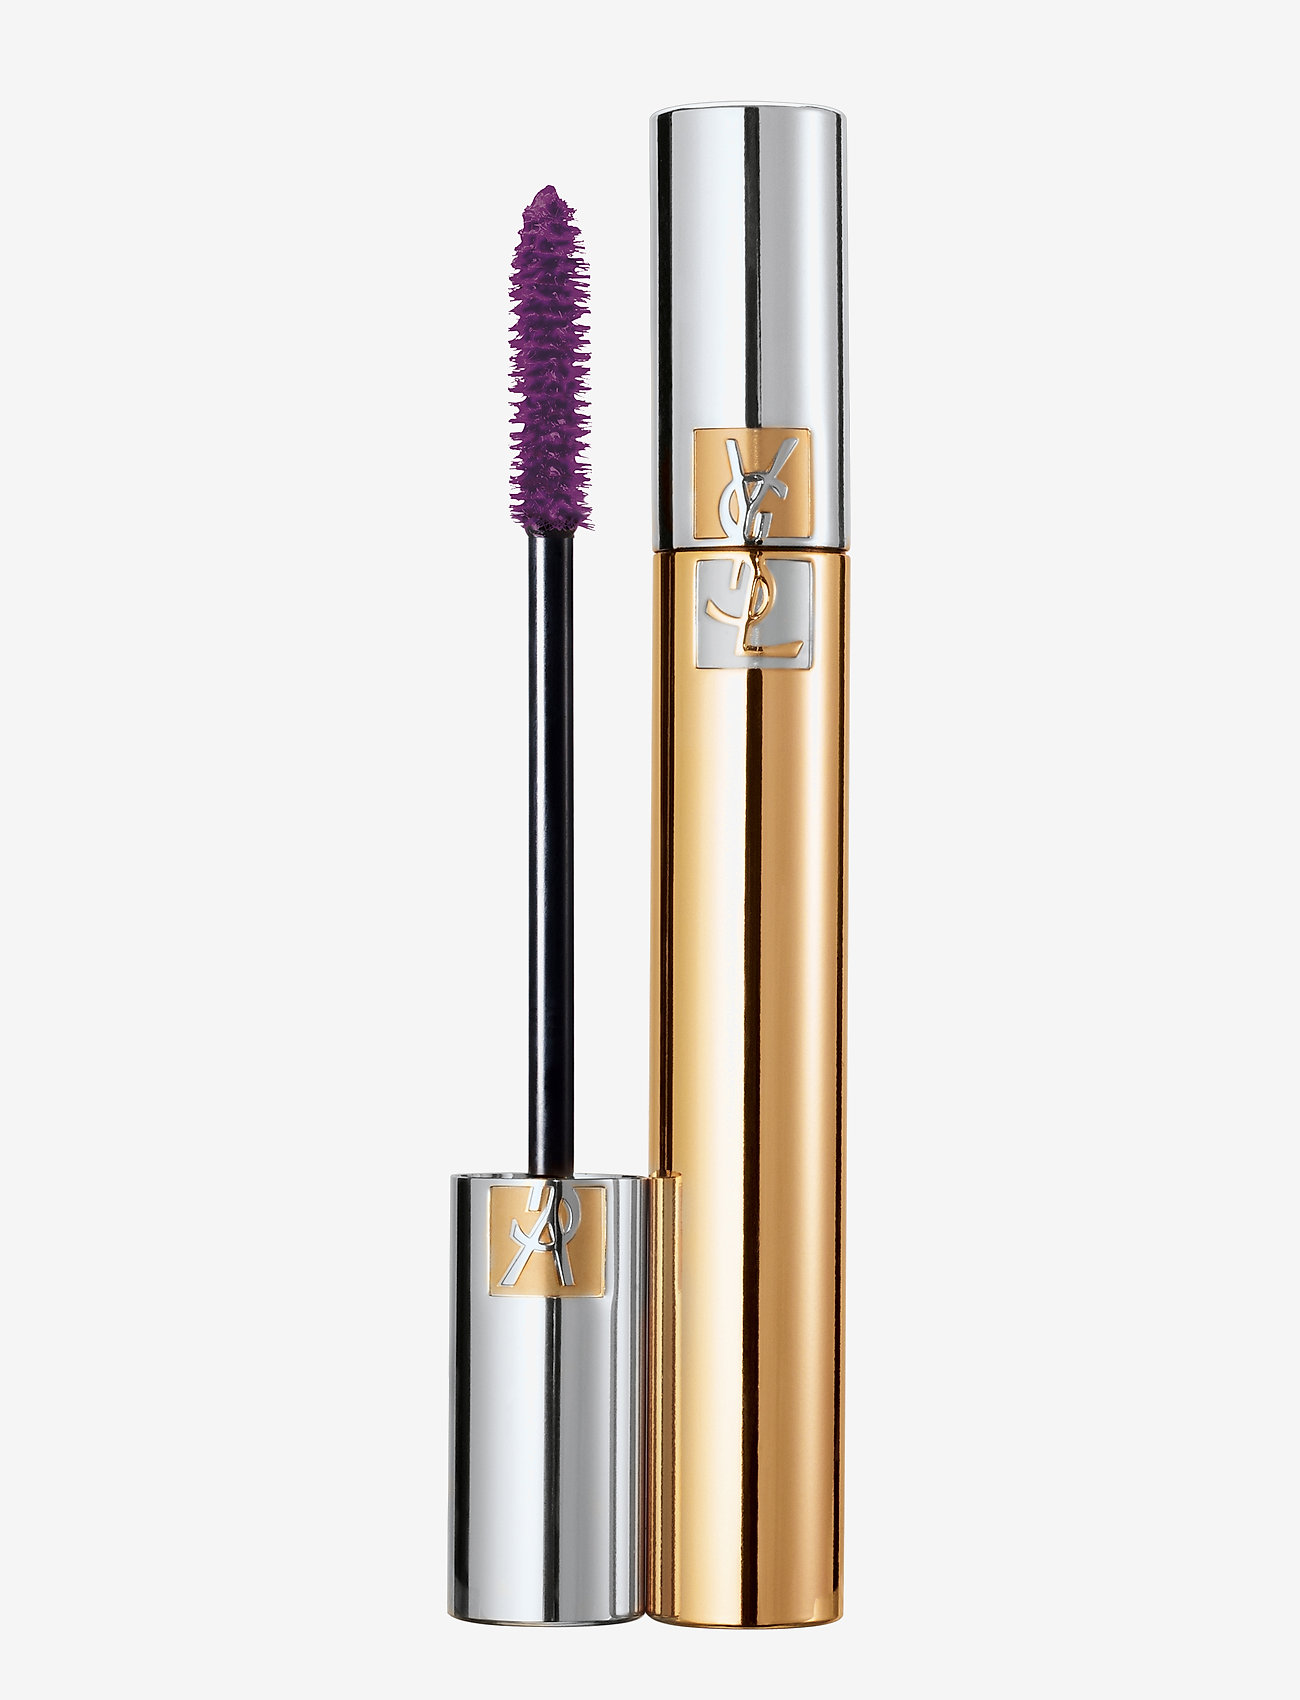 Yves Saint Laurent - Mascara Volume Effet Faux Cils - mascara - 4 voilet fascinant - 0